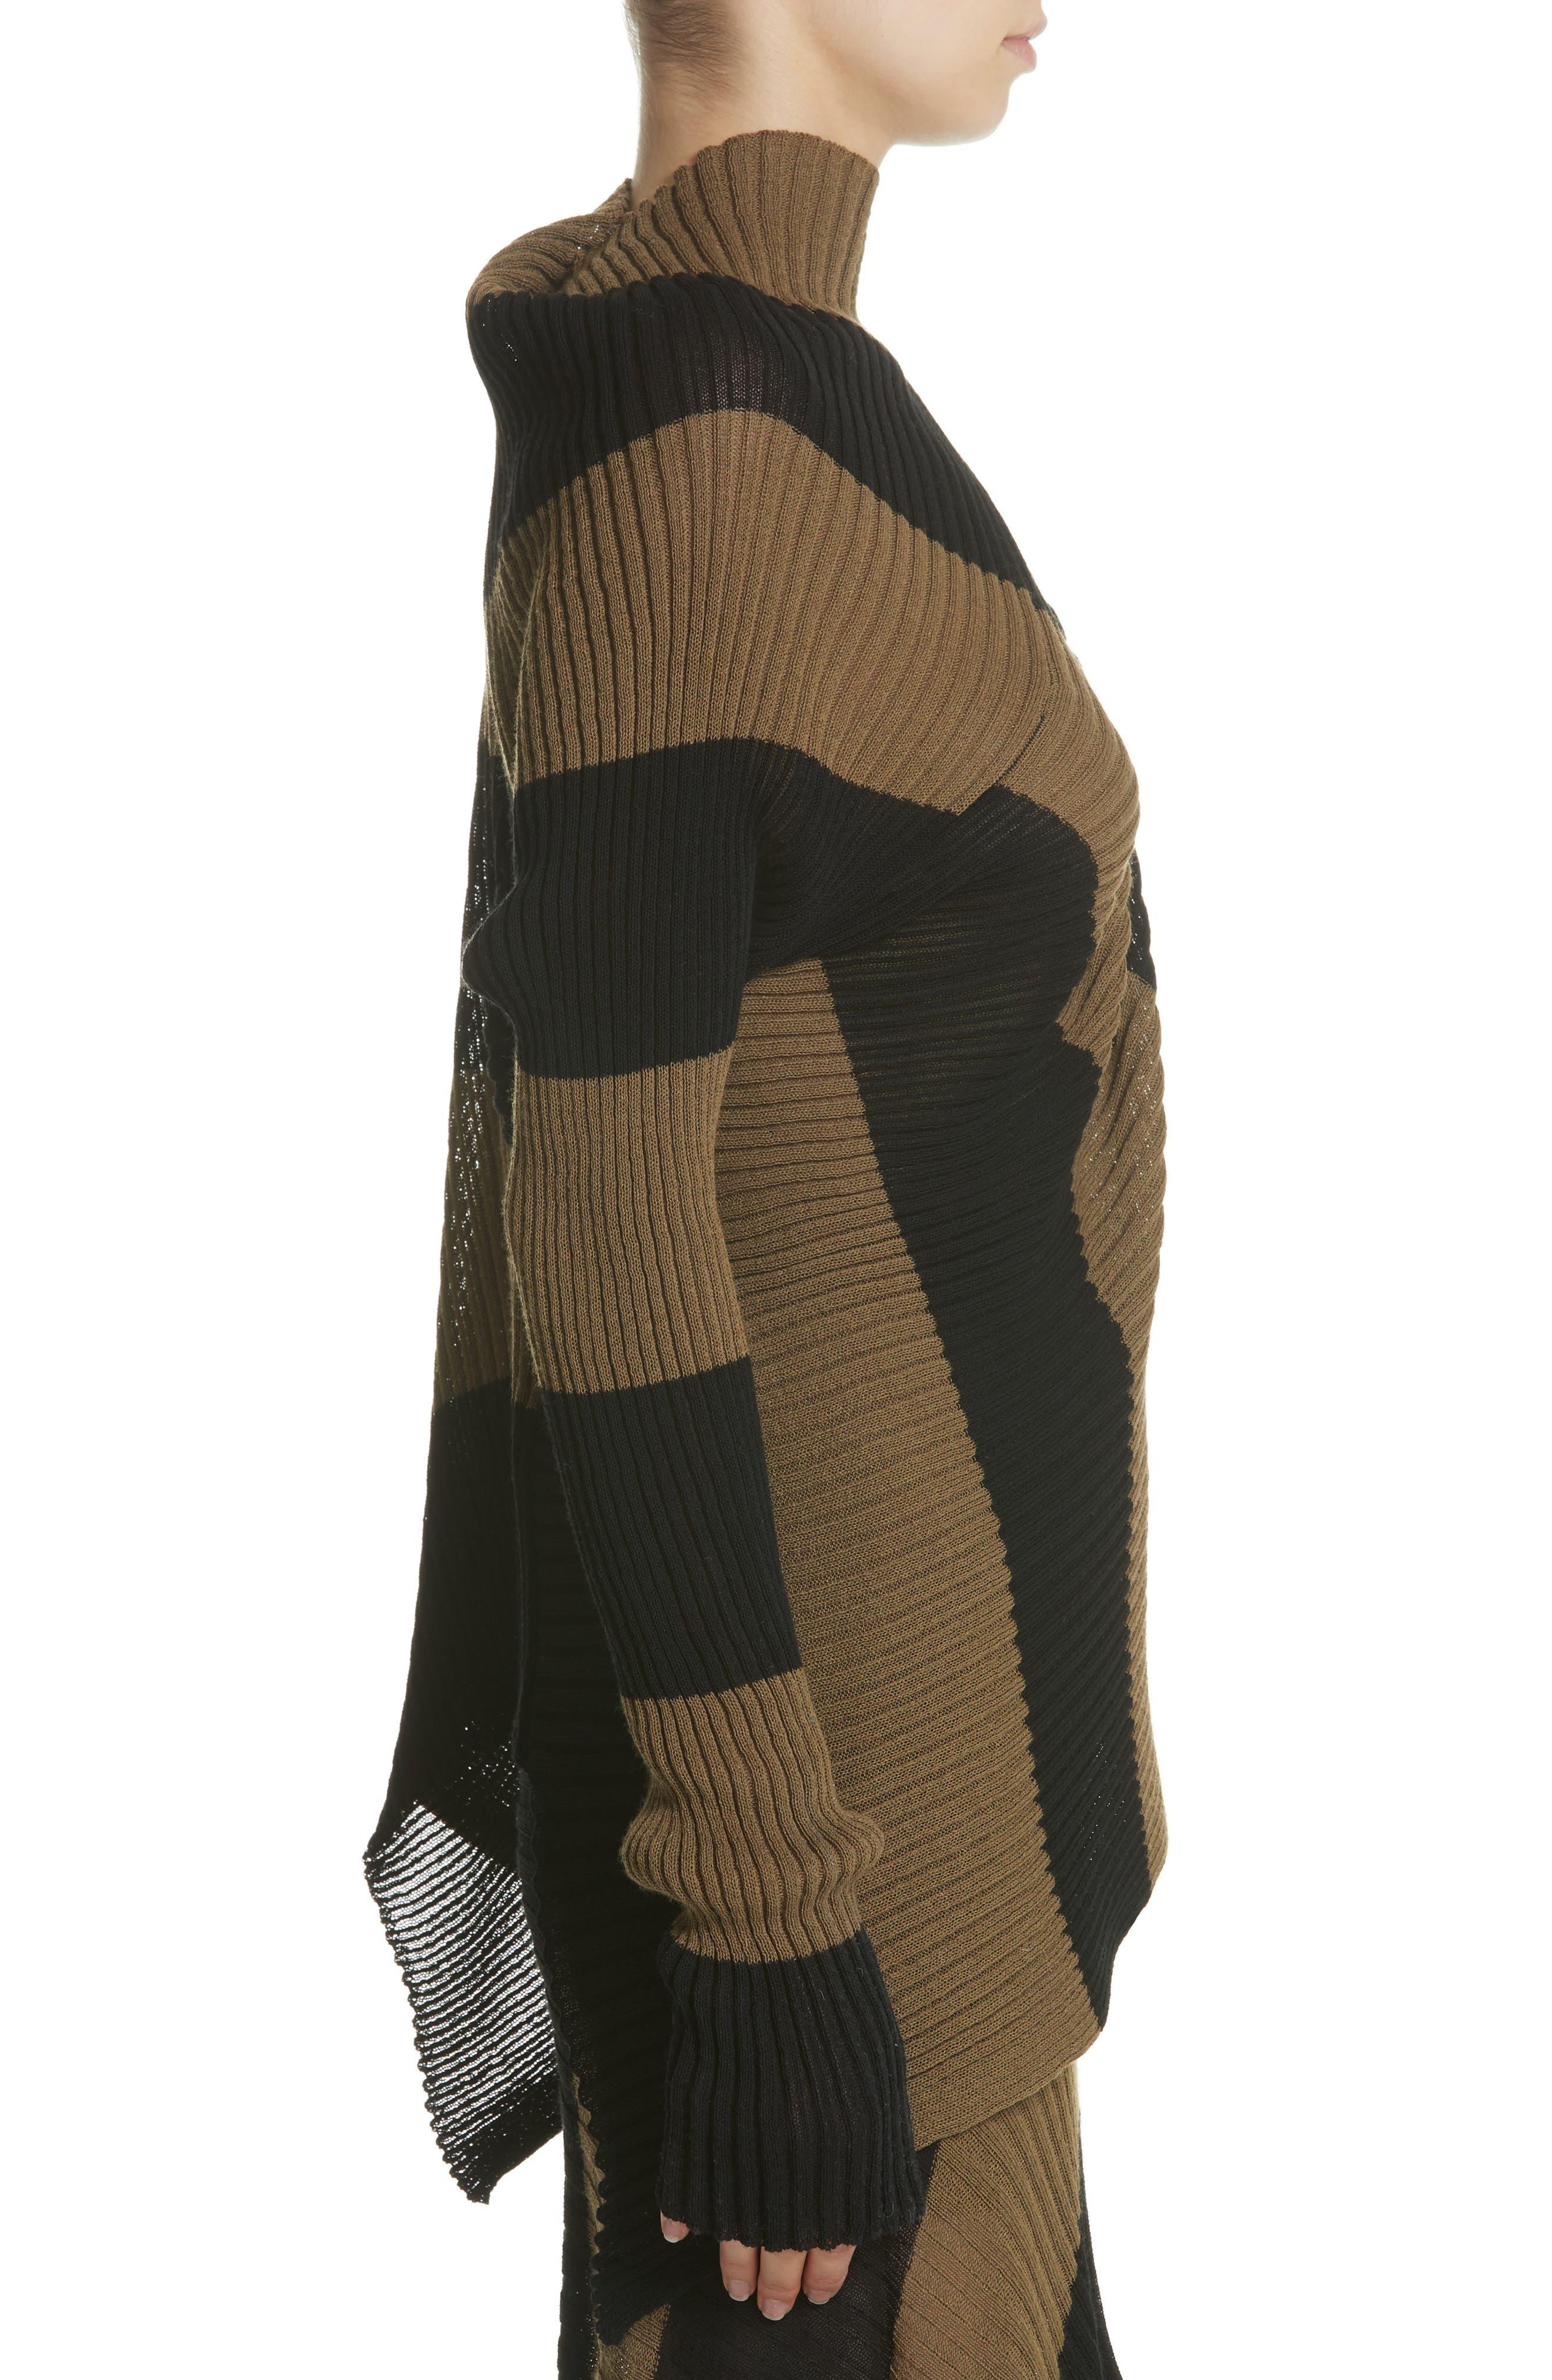 Marques'Almeida Draped One Sleeve Sweater,                             Alternate thumbnail 3, color,                             Khaki/ Black